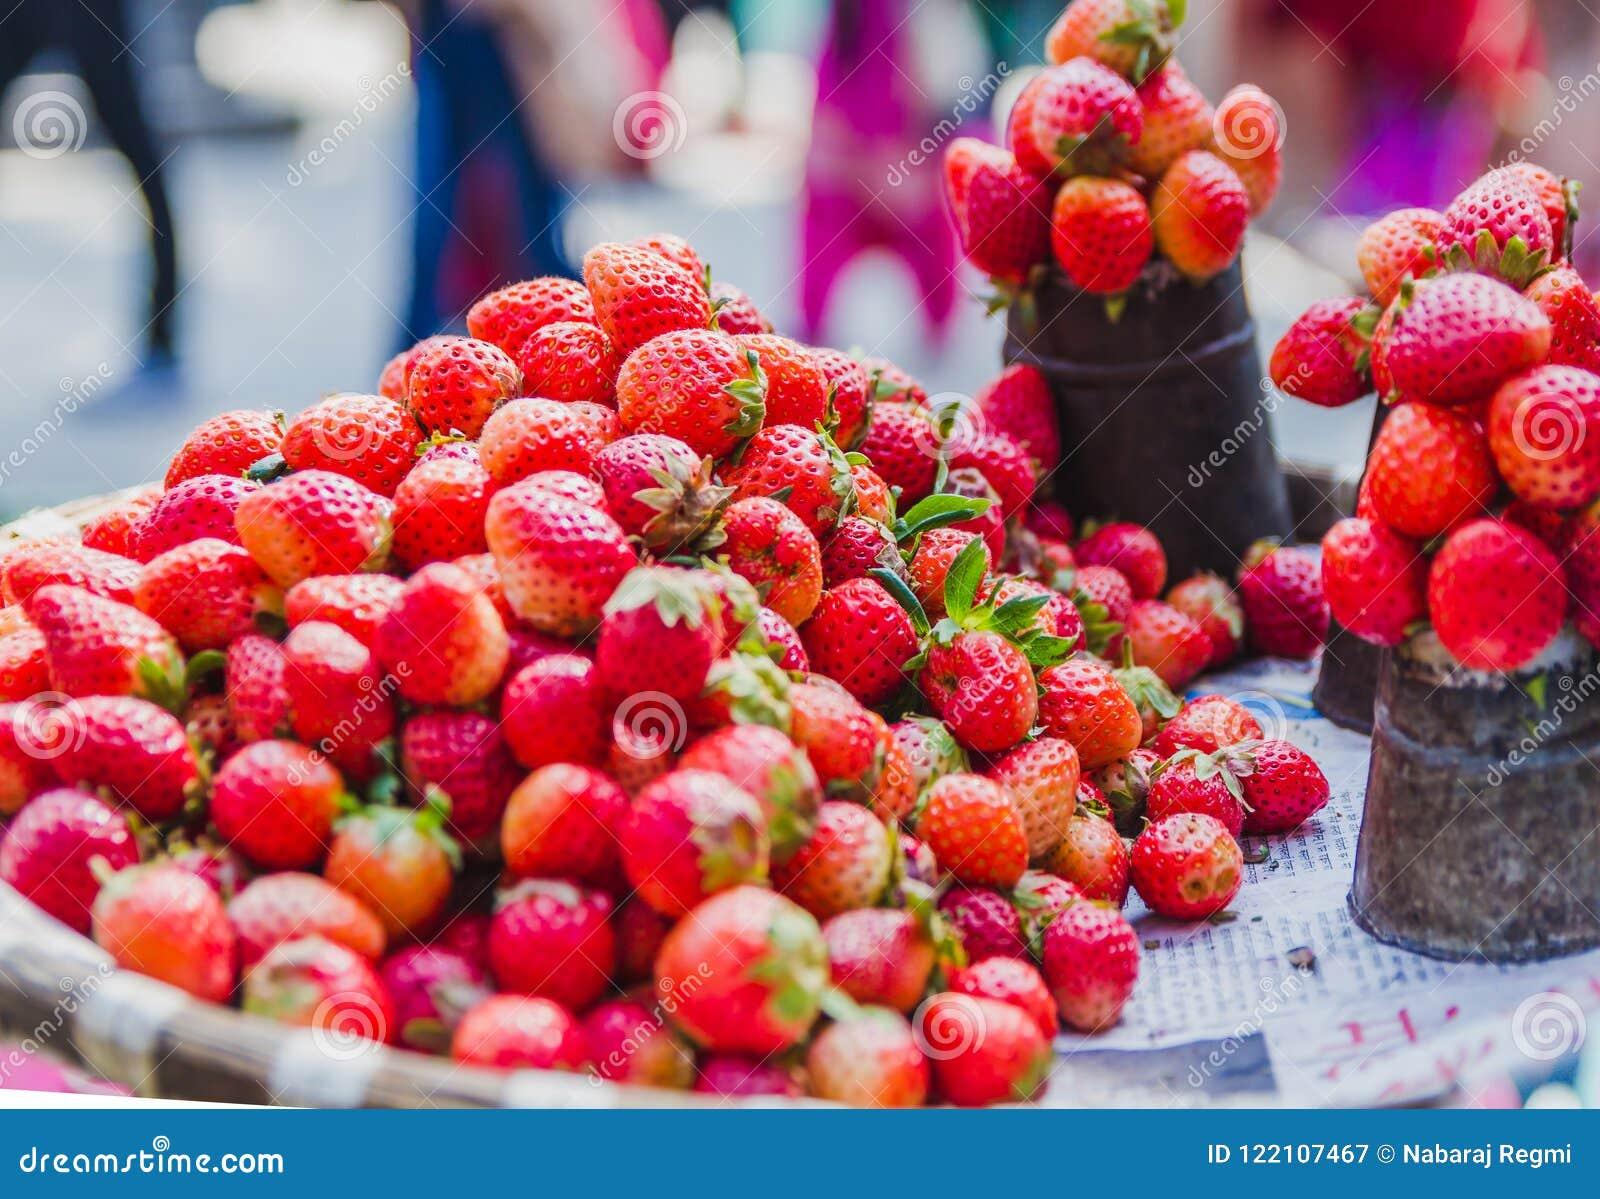 Fresh Strawberry Fruit With Leaf ,Fresh Red Strawberries